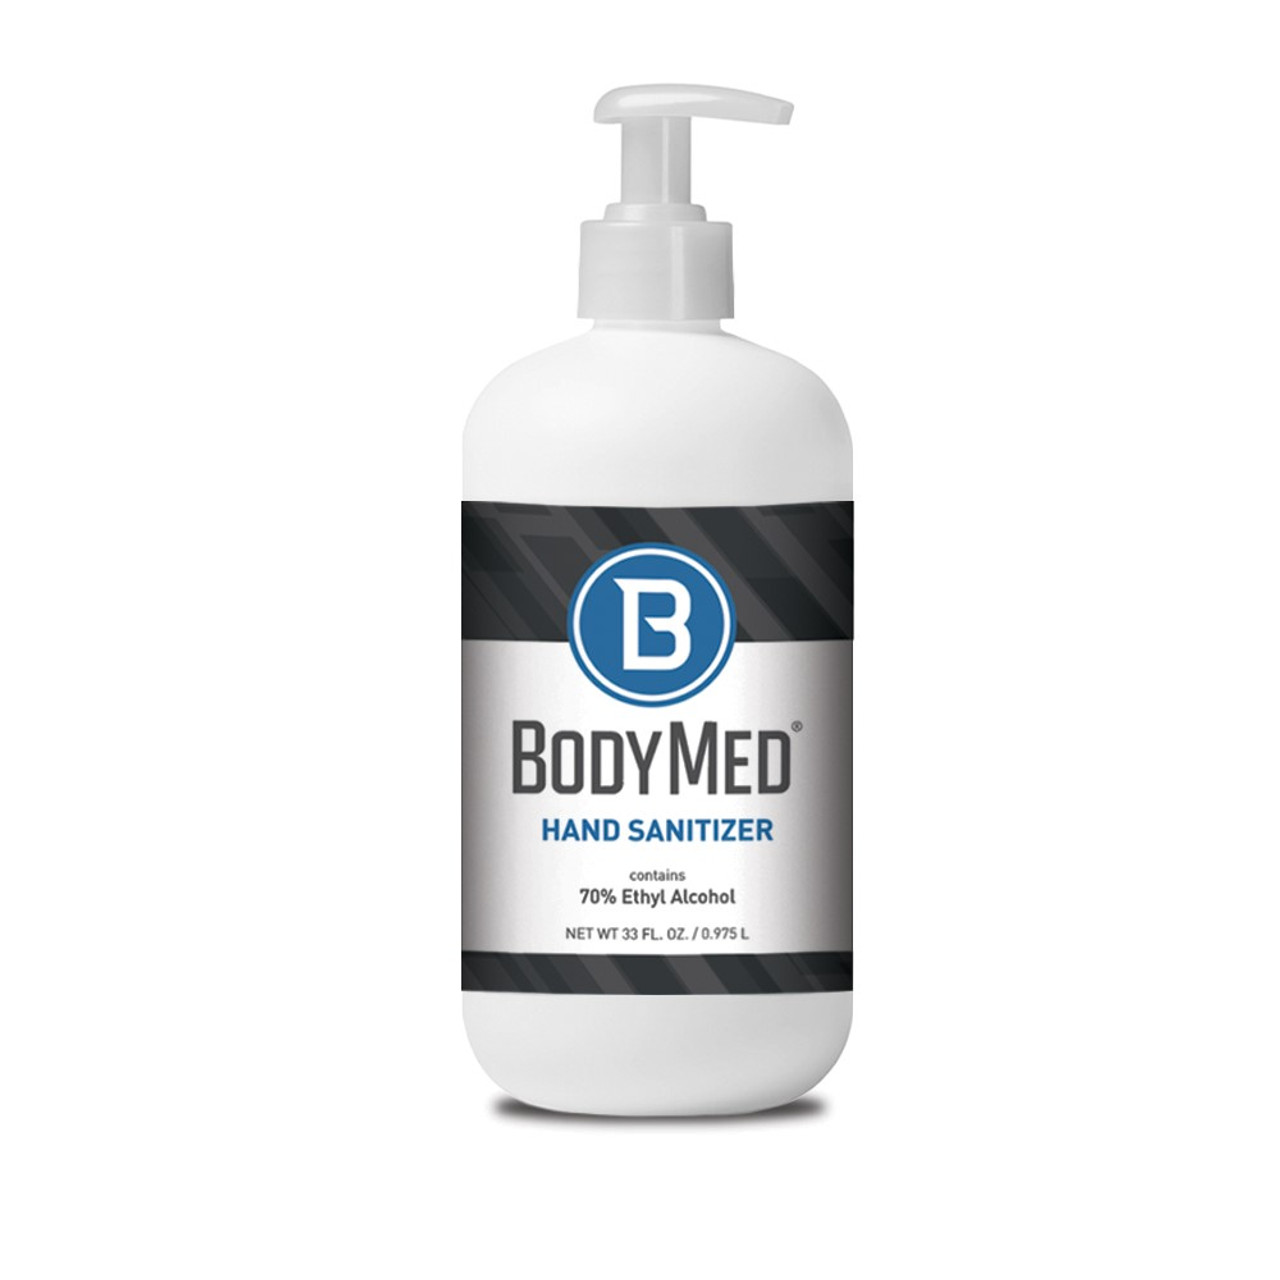 BodyMed Hand Sanitizer, 70% Alcohol